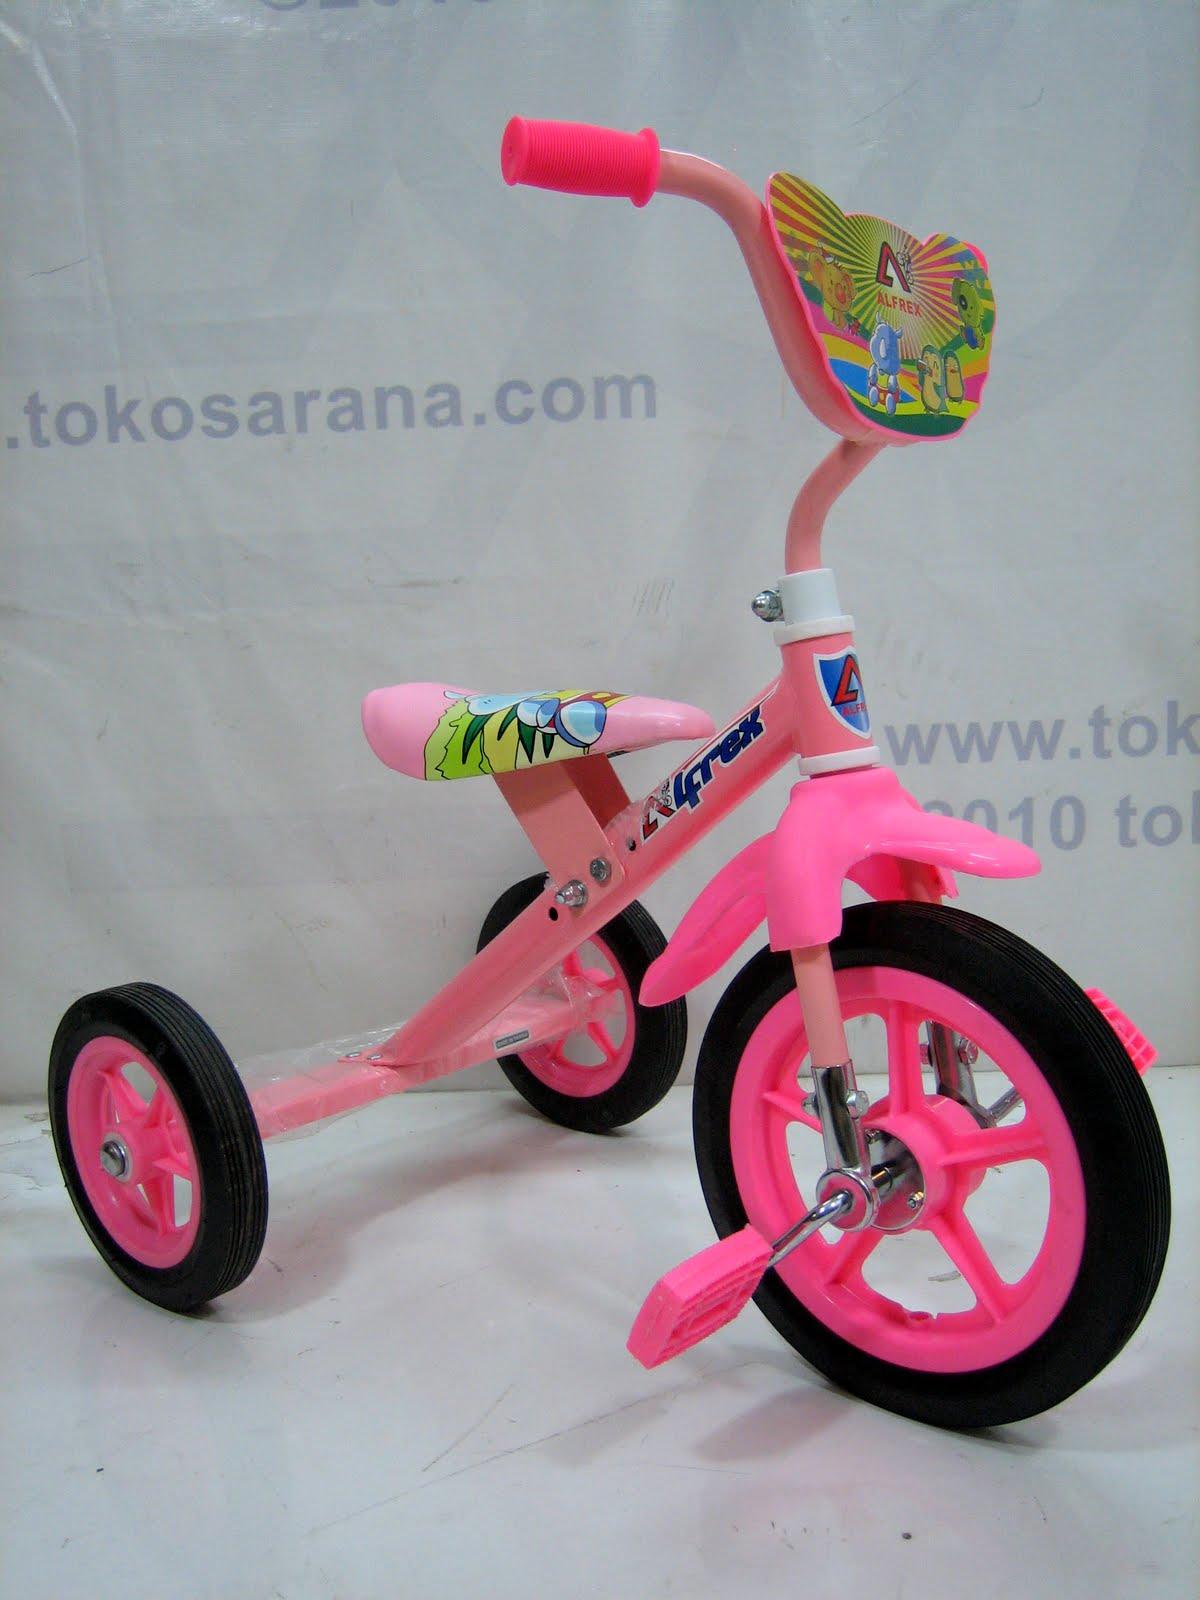 tokosarana™Jakarta Jatinegara: Sepeda Roda Tiga BMX Arava